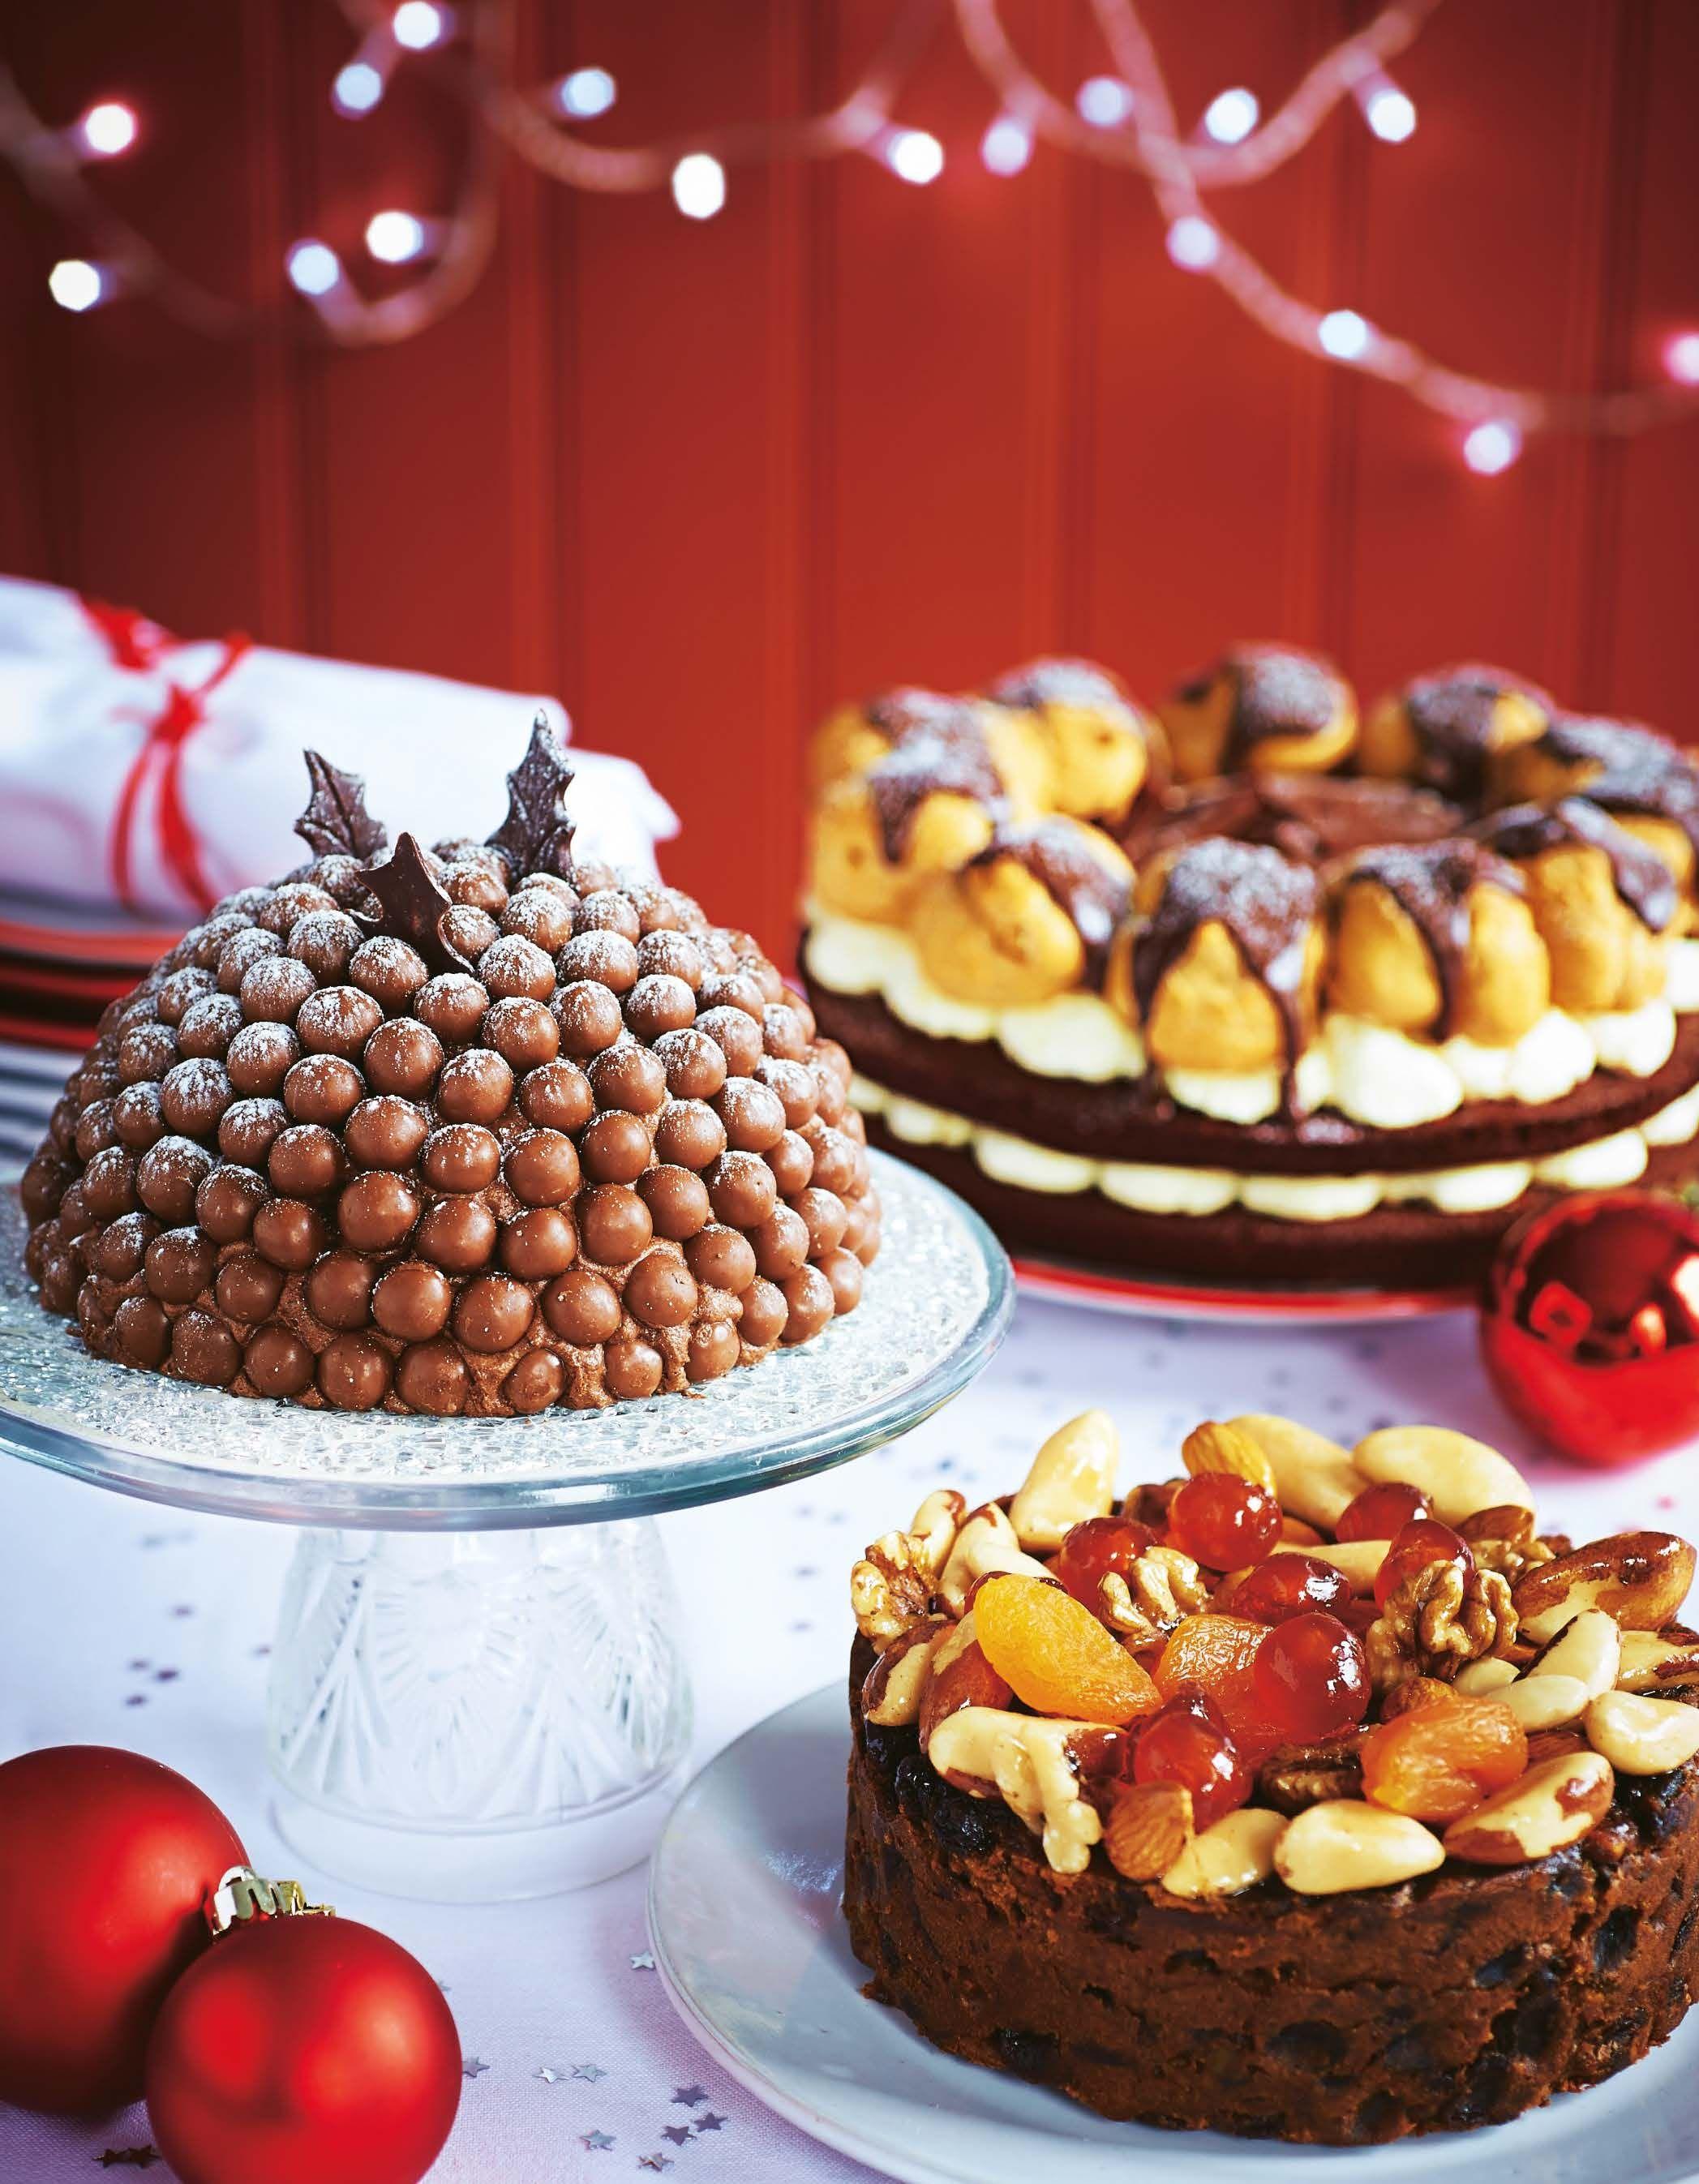 Asda magazine december 2013 cake decorated with fruit